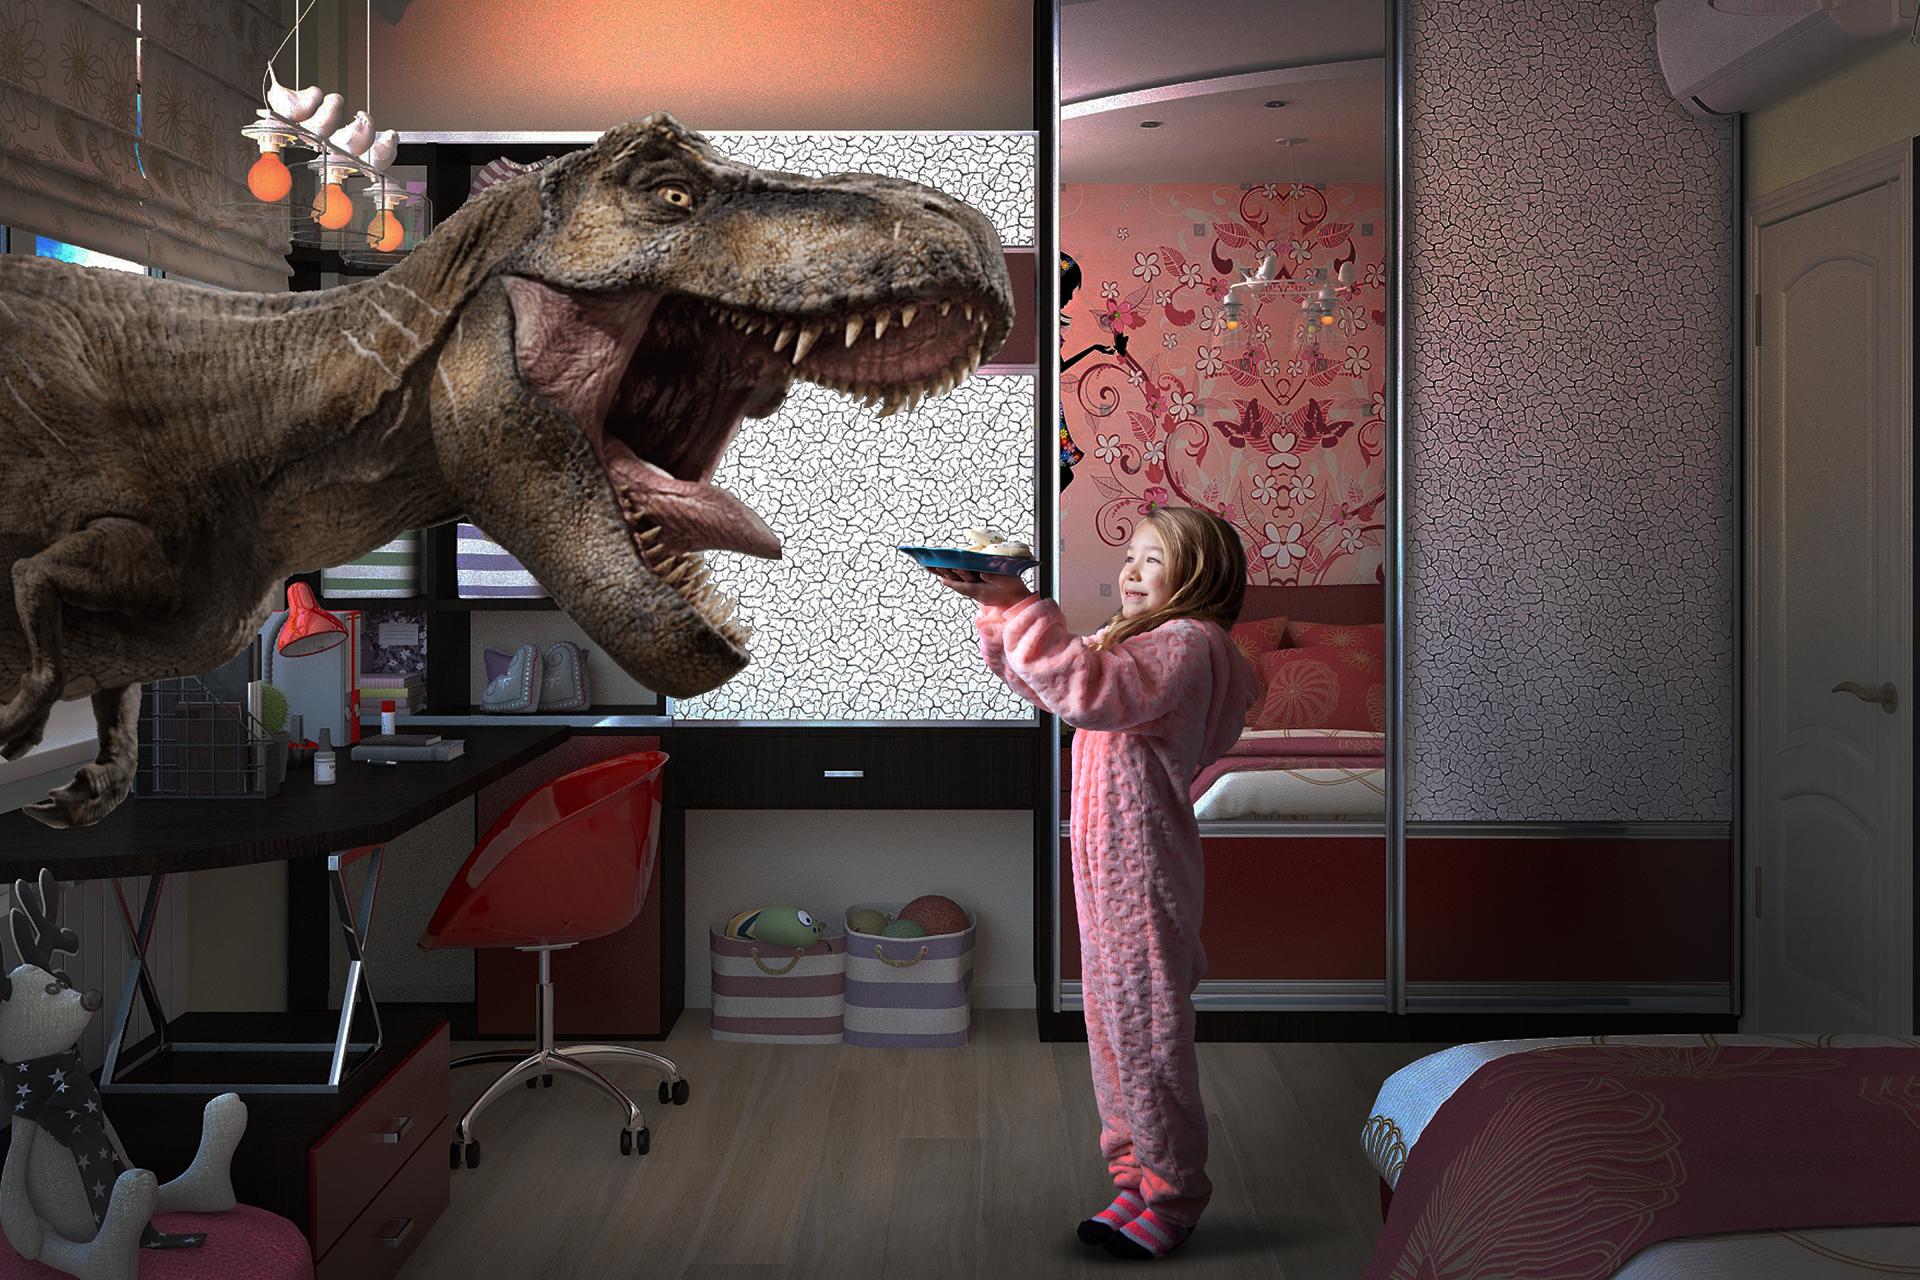 koko dinosaur.jpg